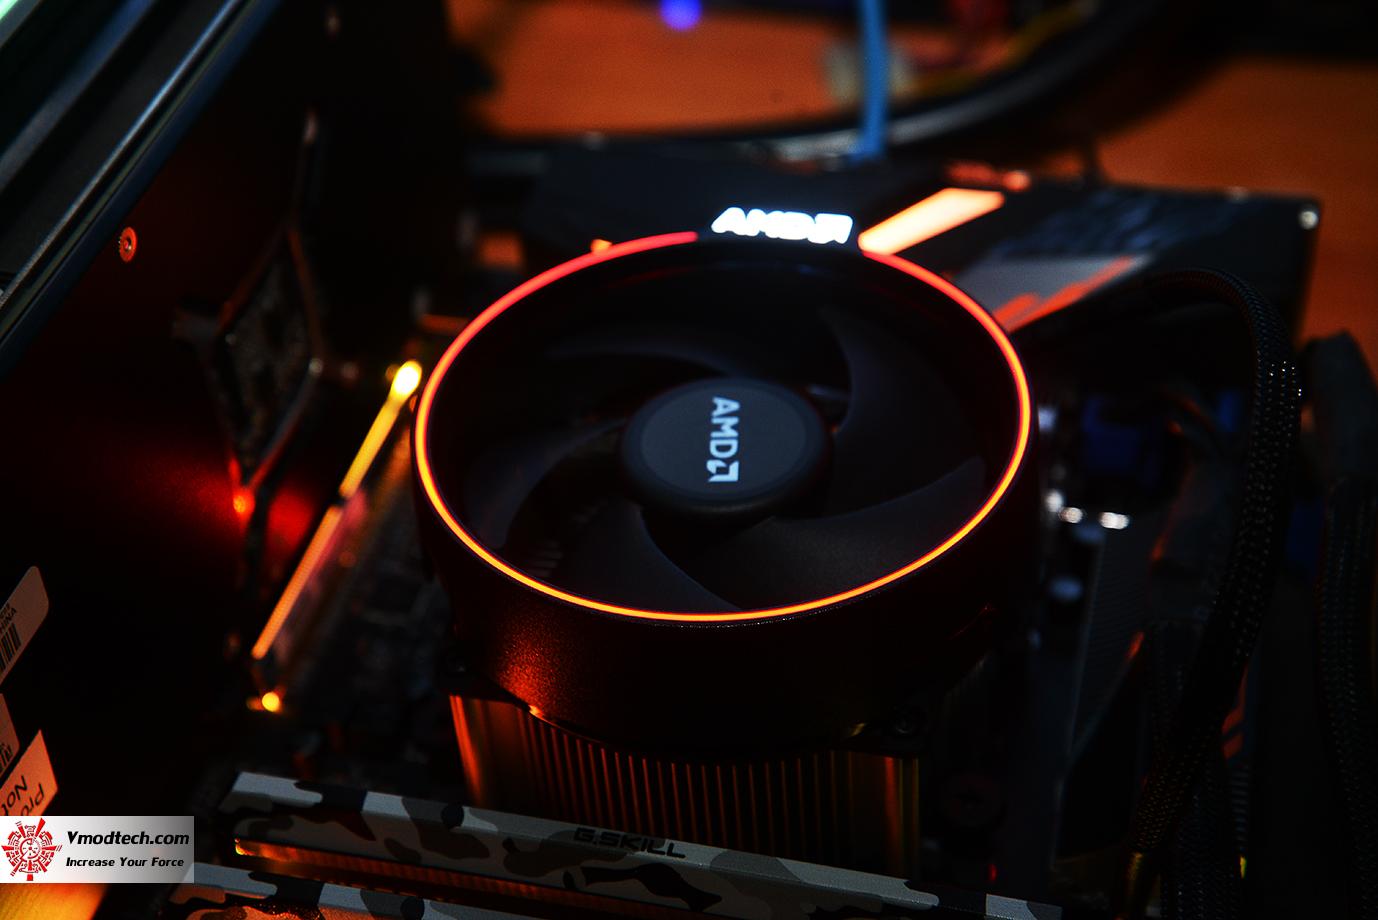 dsc 2466 AMD RYZEN 7 2700 and StoreMI Technology Review